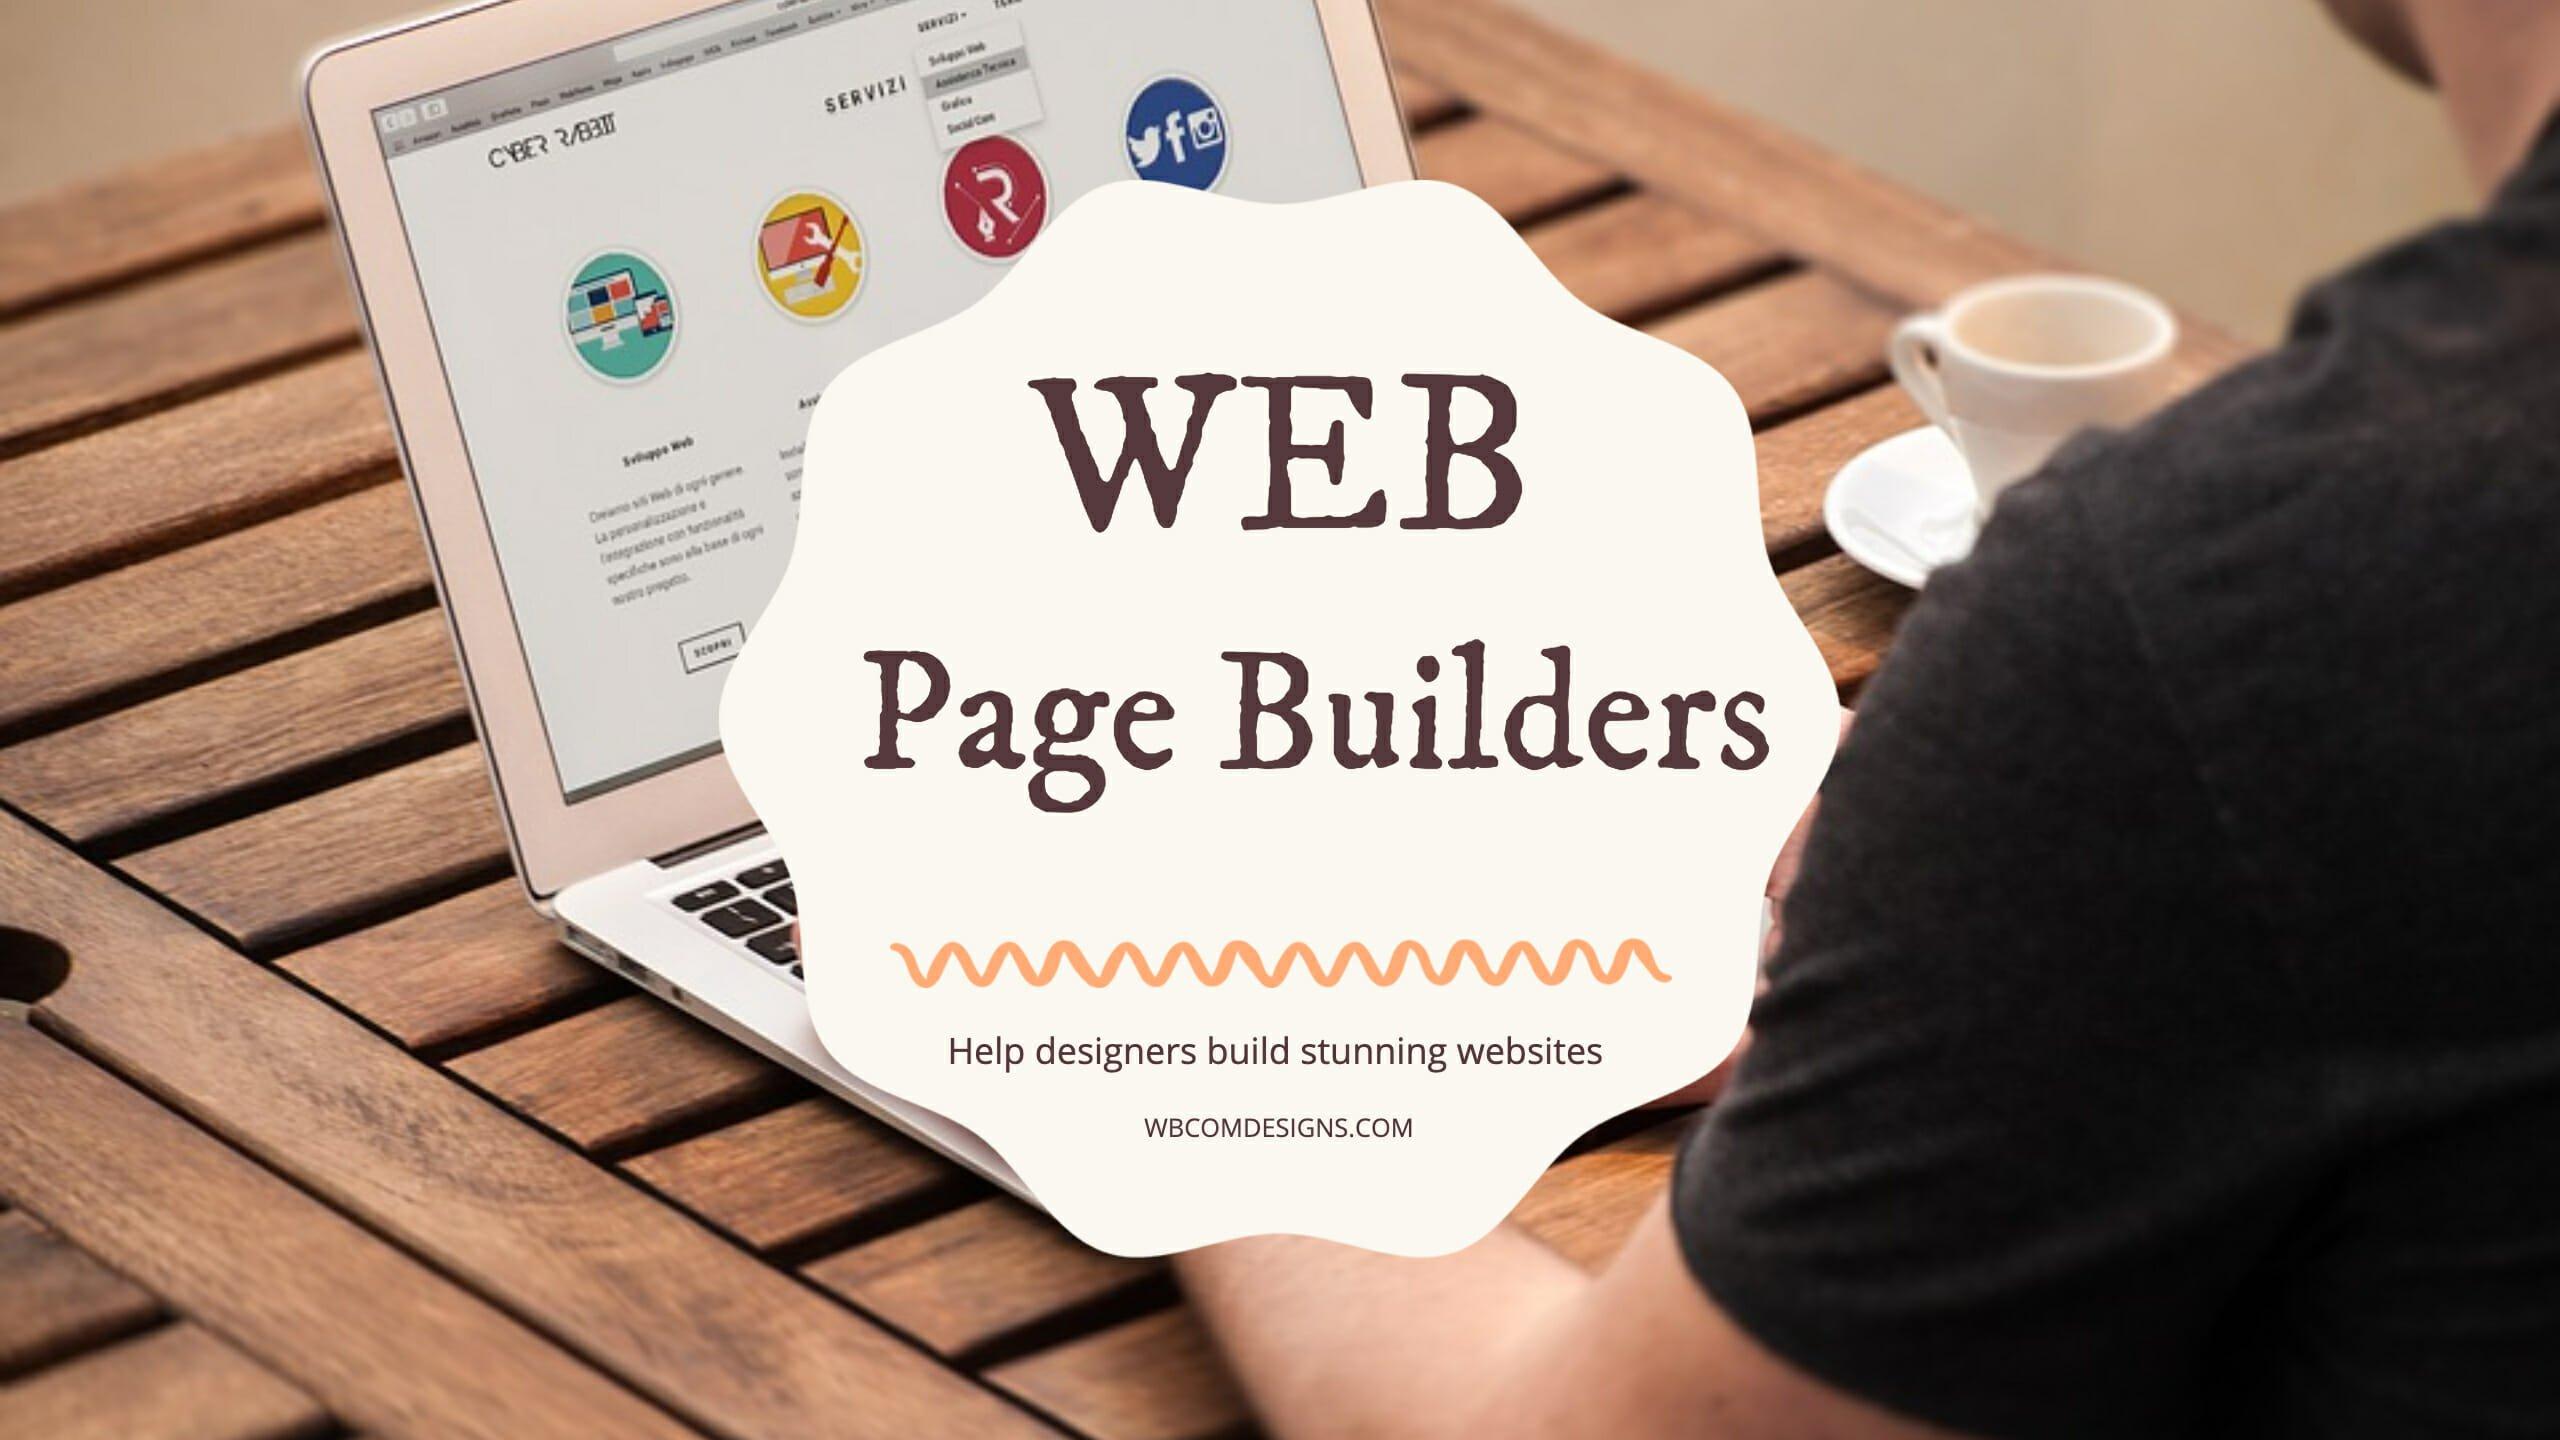 build stunning websites,help designers build stunning websites